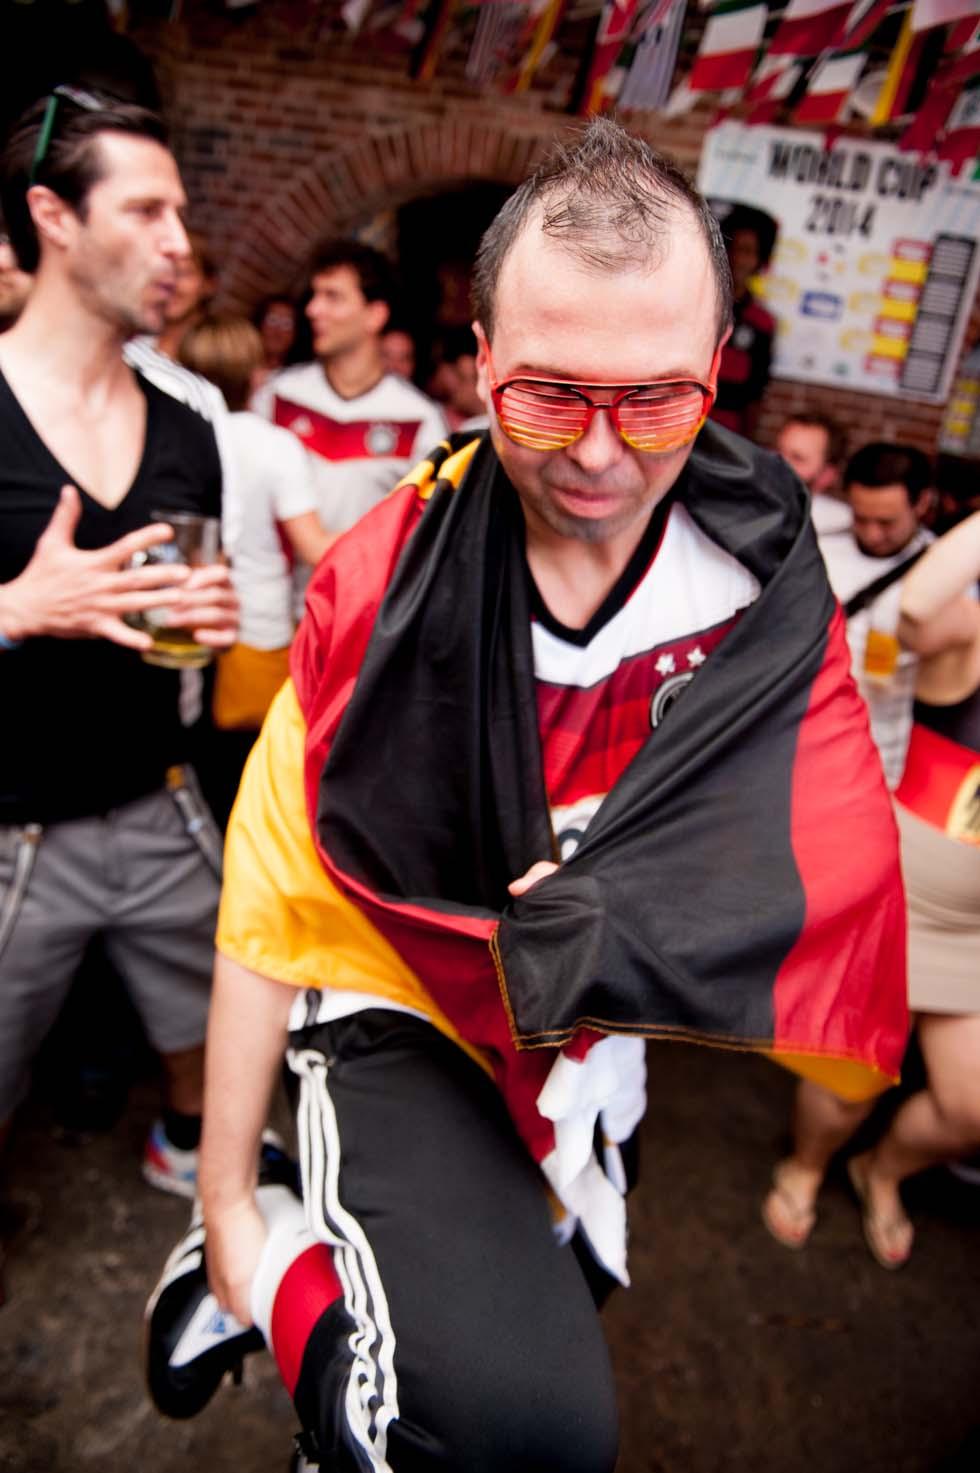 zum-schneider-nyc-2014-germany-portugal-world-cup-7756.jpg